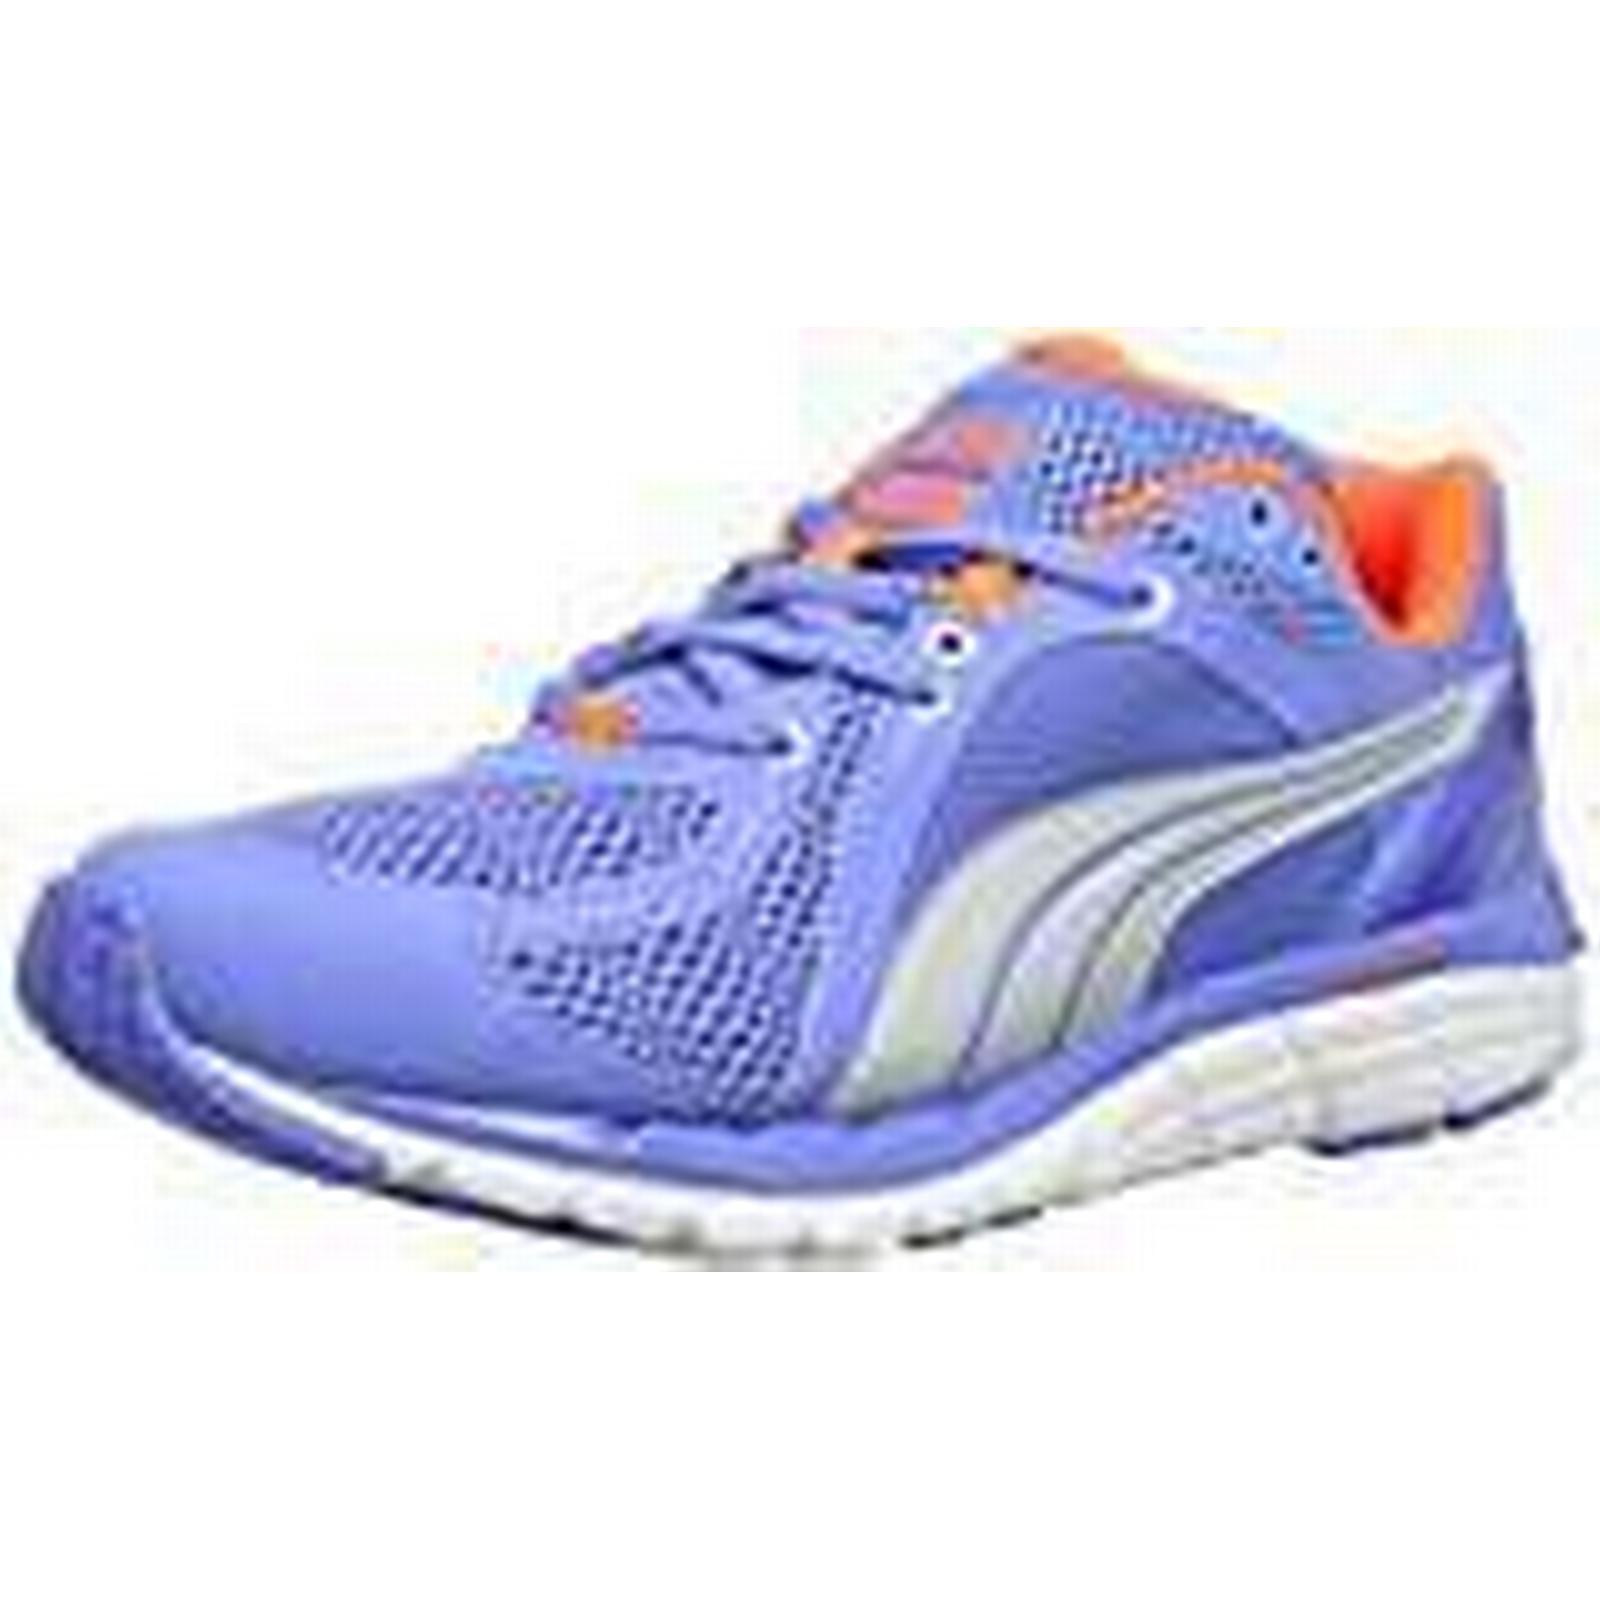 Puma Faas 600 S, 5 Women's Running Shoes, Umrne/White/Peach, 5 S, UK 3190fd